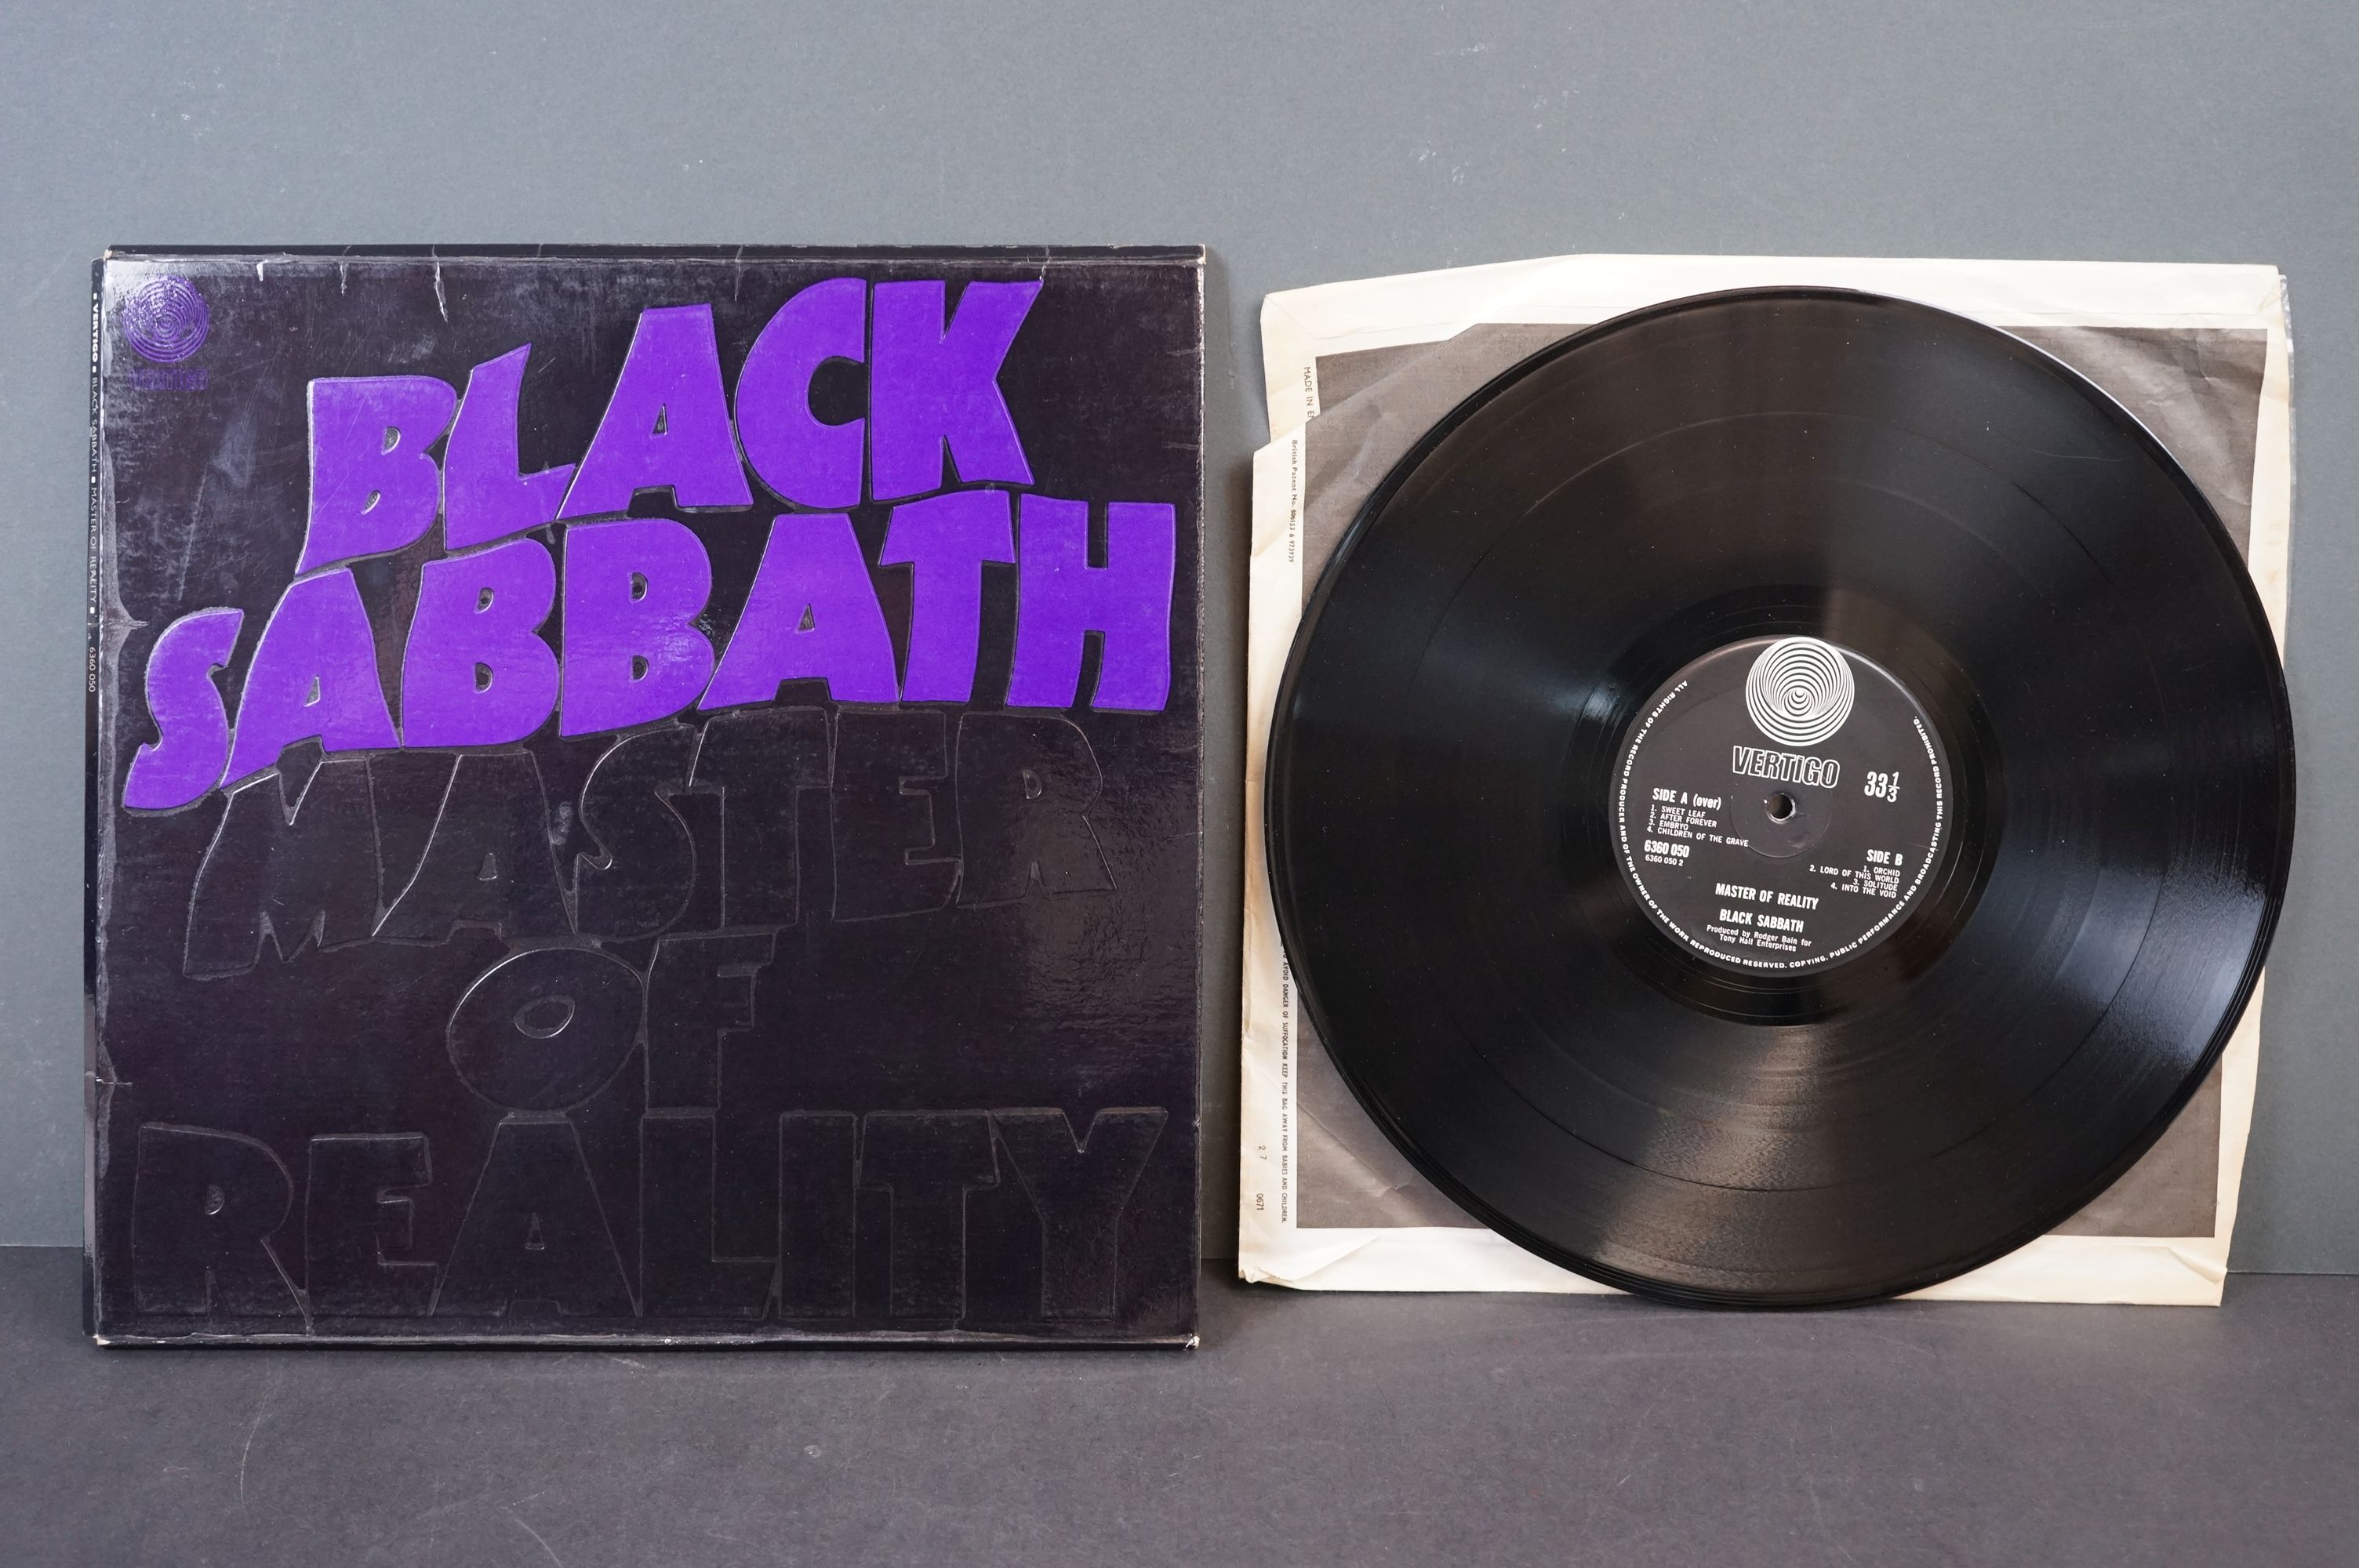 Vinyl - Black Sabbath - Master Of Reality. Original UK 1971 1st Black label, Swirl Vertigo label - Image 3 of 5